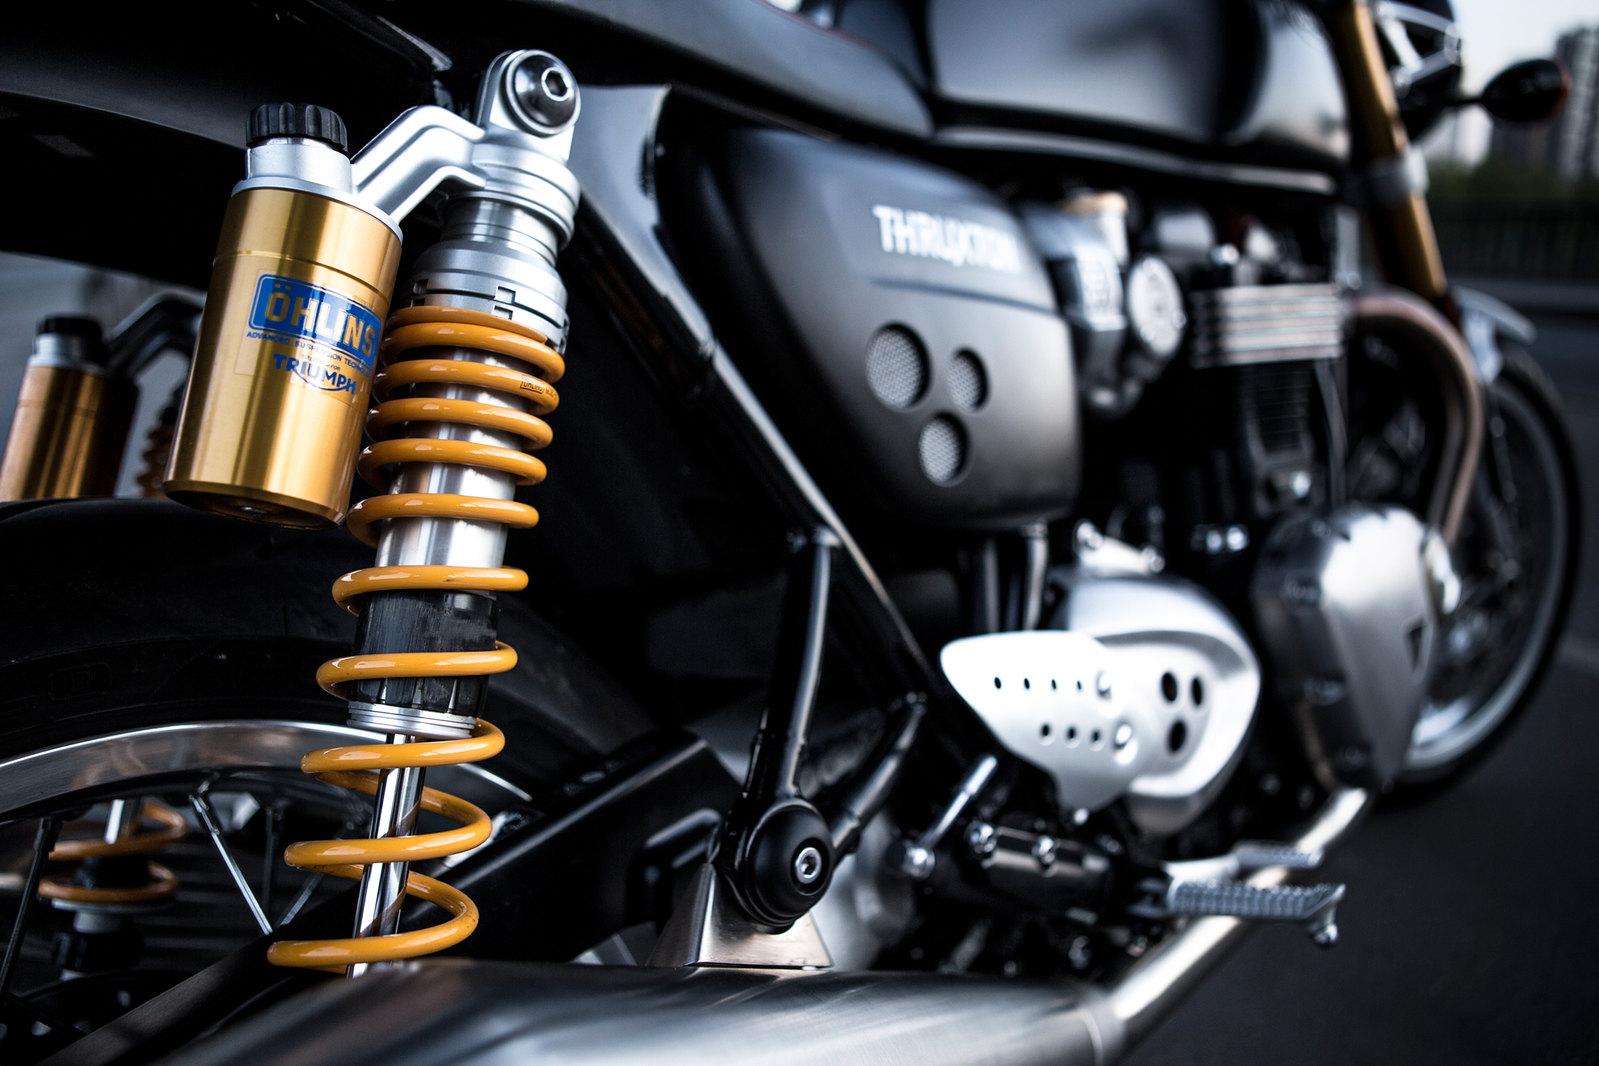 Essai-moto-Triumph-ThruxtonR (5)